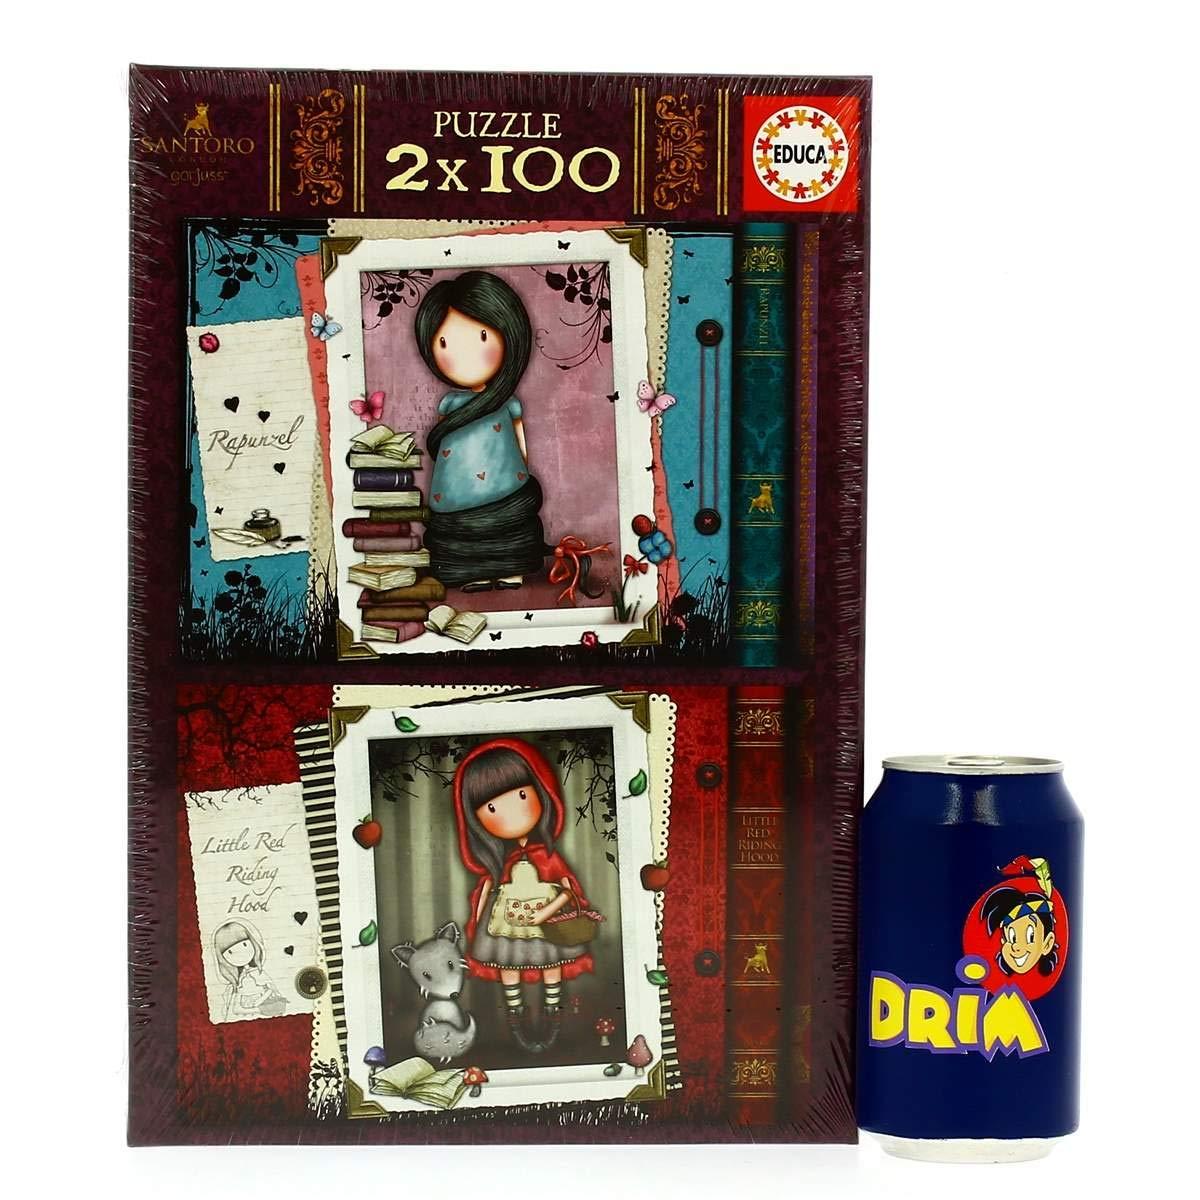 Hood17822 Puzzle 2x100 Borrás Educa Riding Red Little Gorjuss xeCorBd